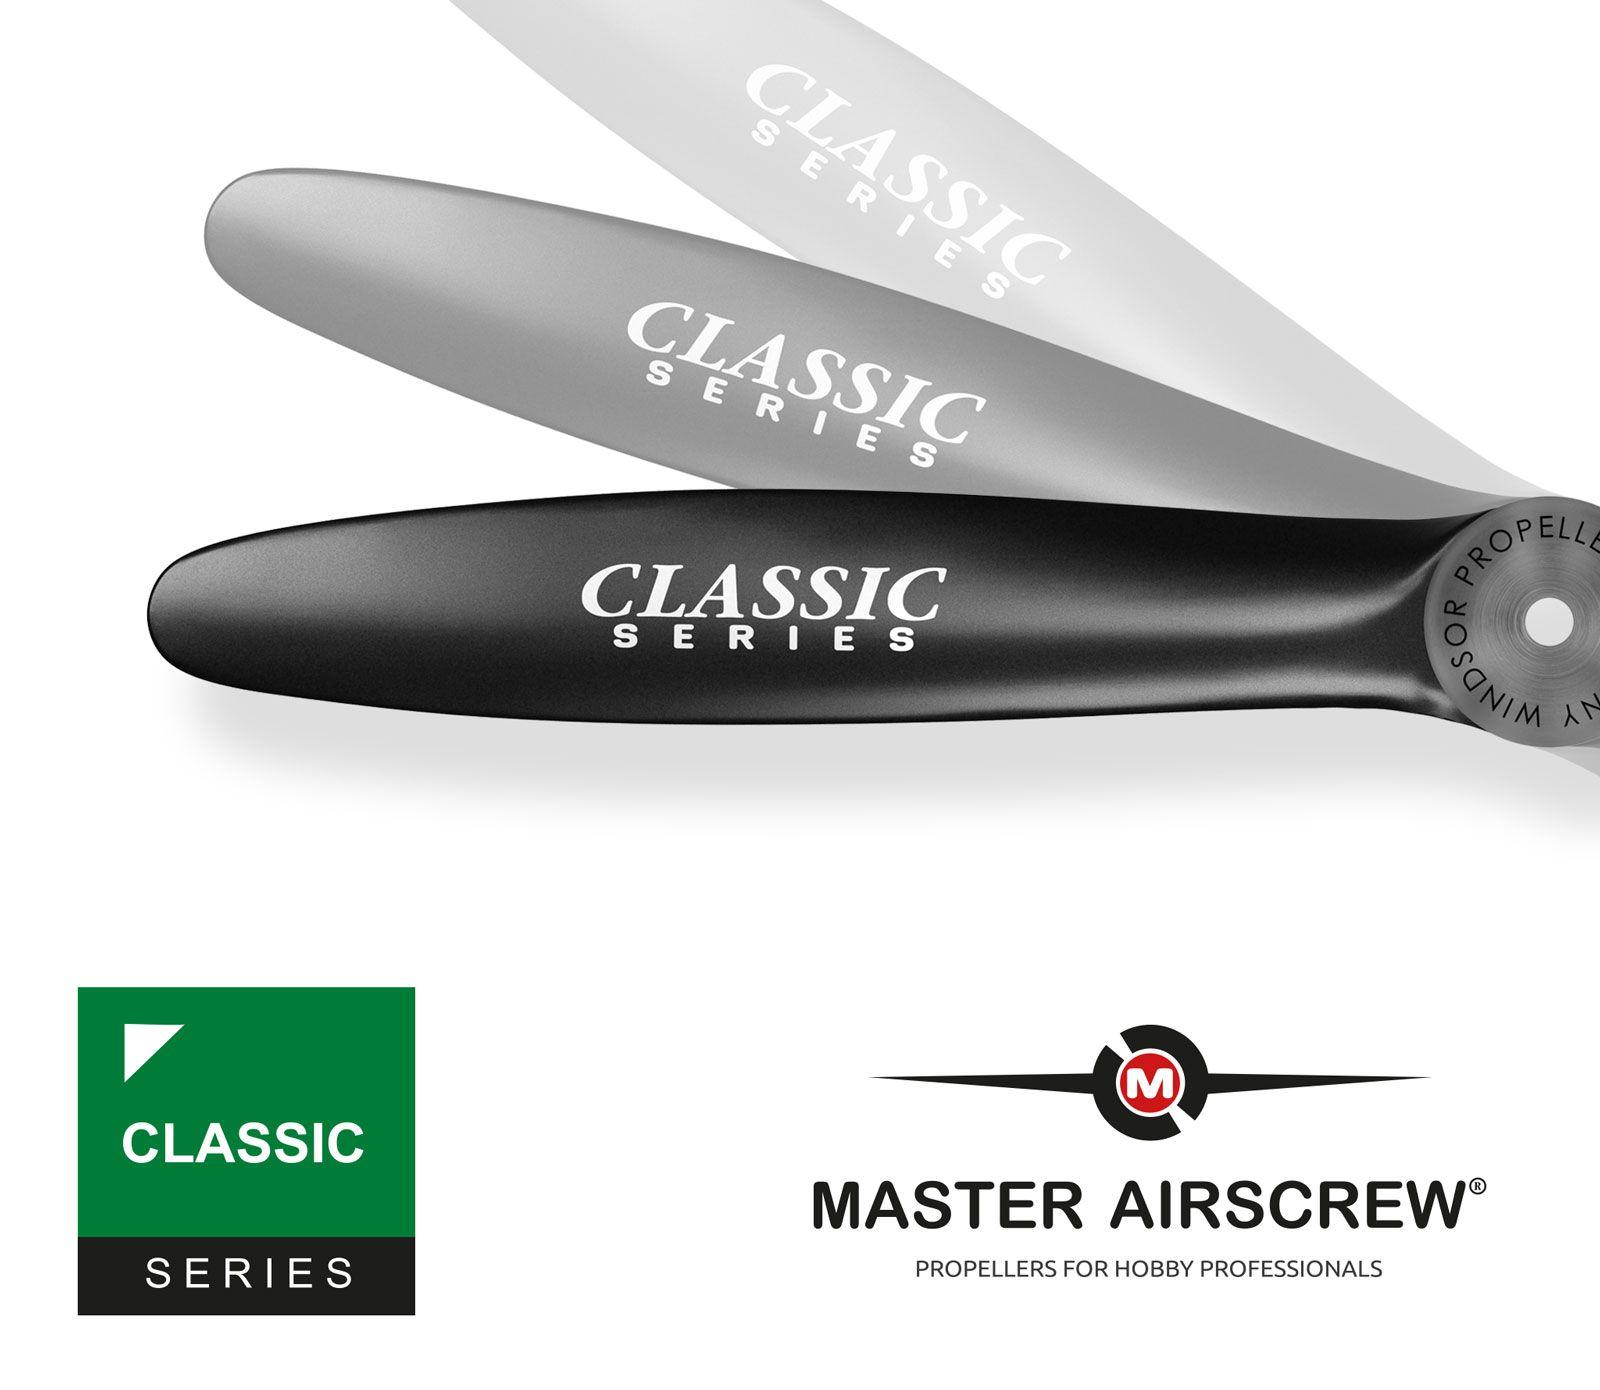 Hélice Para Aeromodelos A Combustão Master Airscrew 20X8 - Série Classic  - King Models